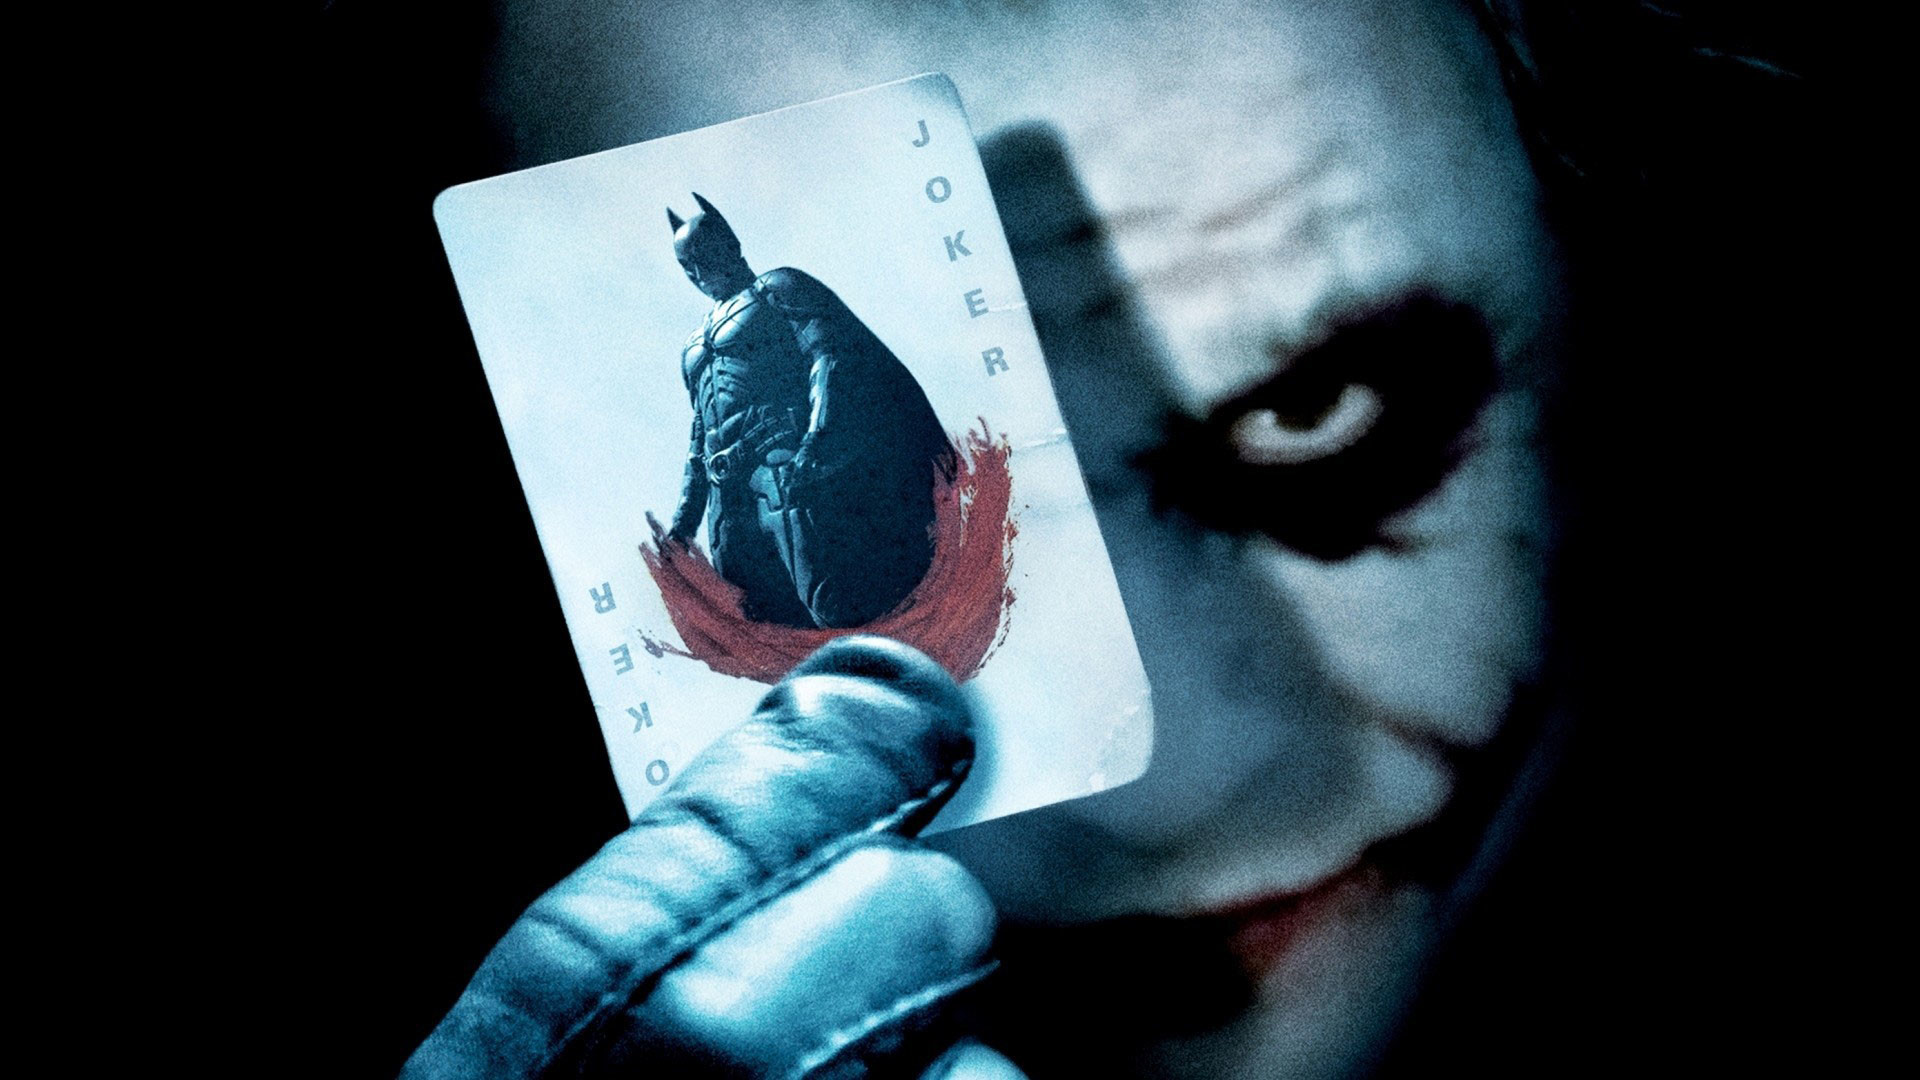 hd pics photos batman enemy joker cars hollywood hd quality desktop  background wallpaper